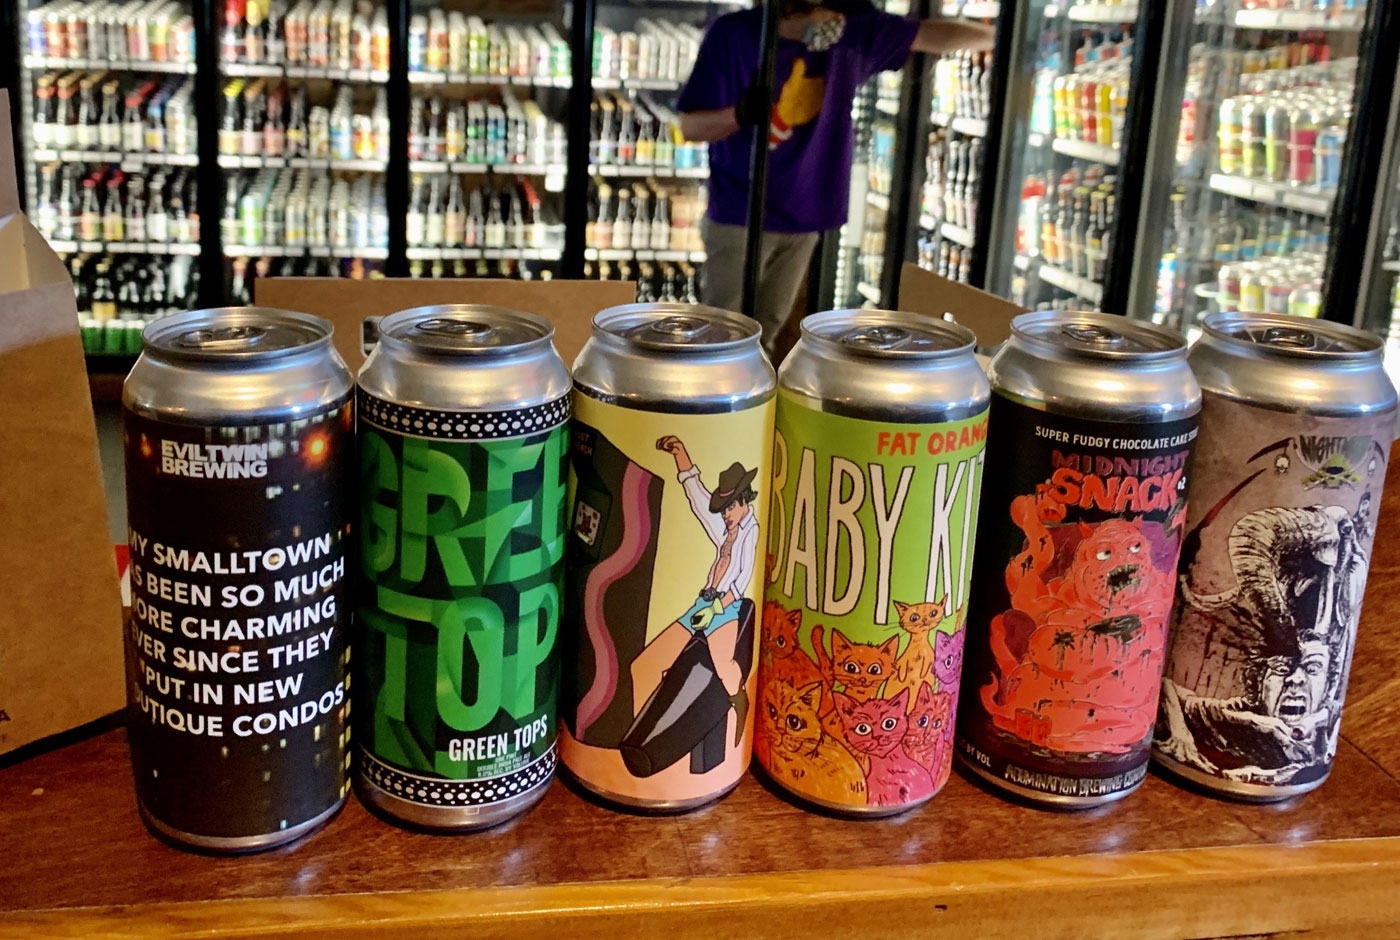 Peaks And Pints New Beers In Stock 5 6 20 Peaks And Pints